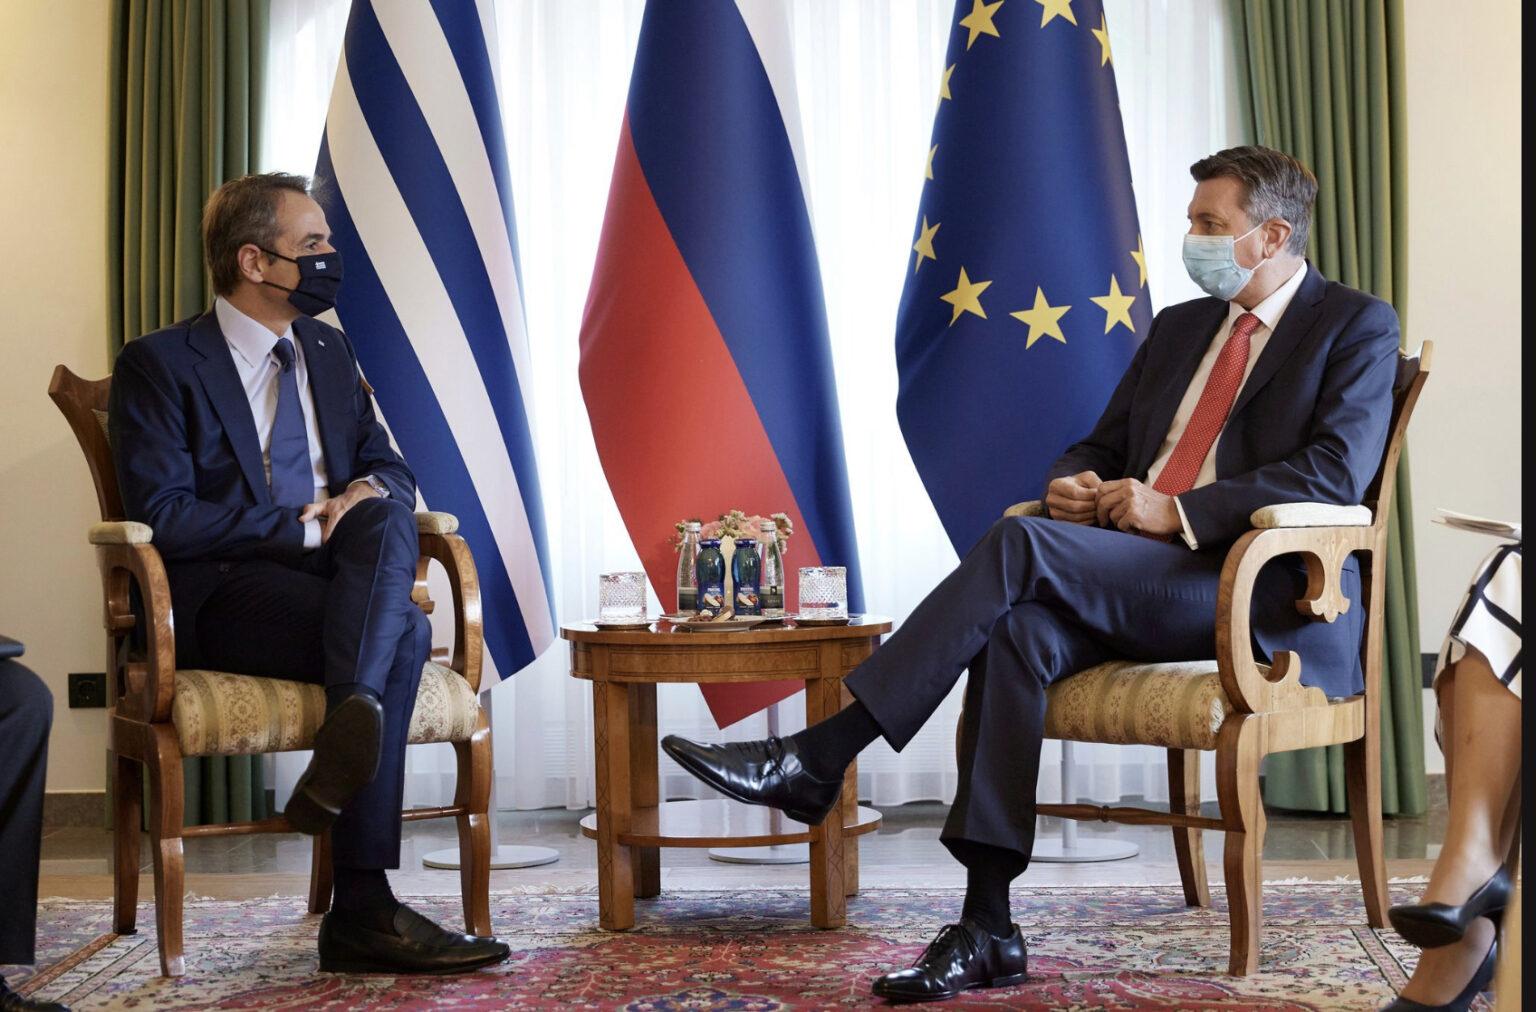 Grčka: Mitsotakis se sastao sa Janšom i Pahorom